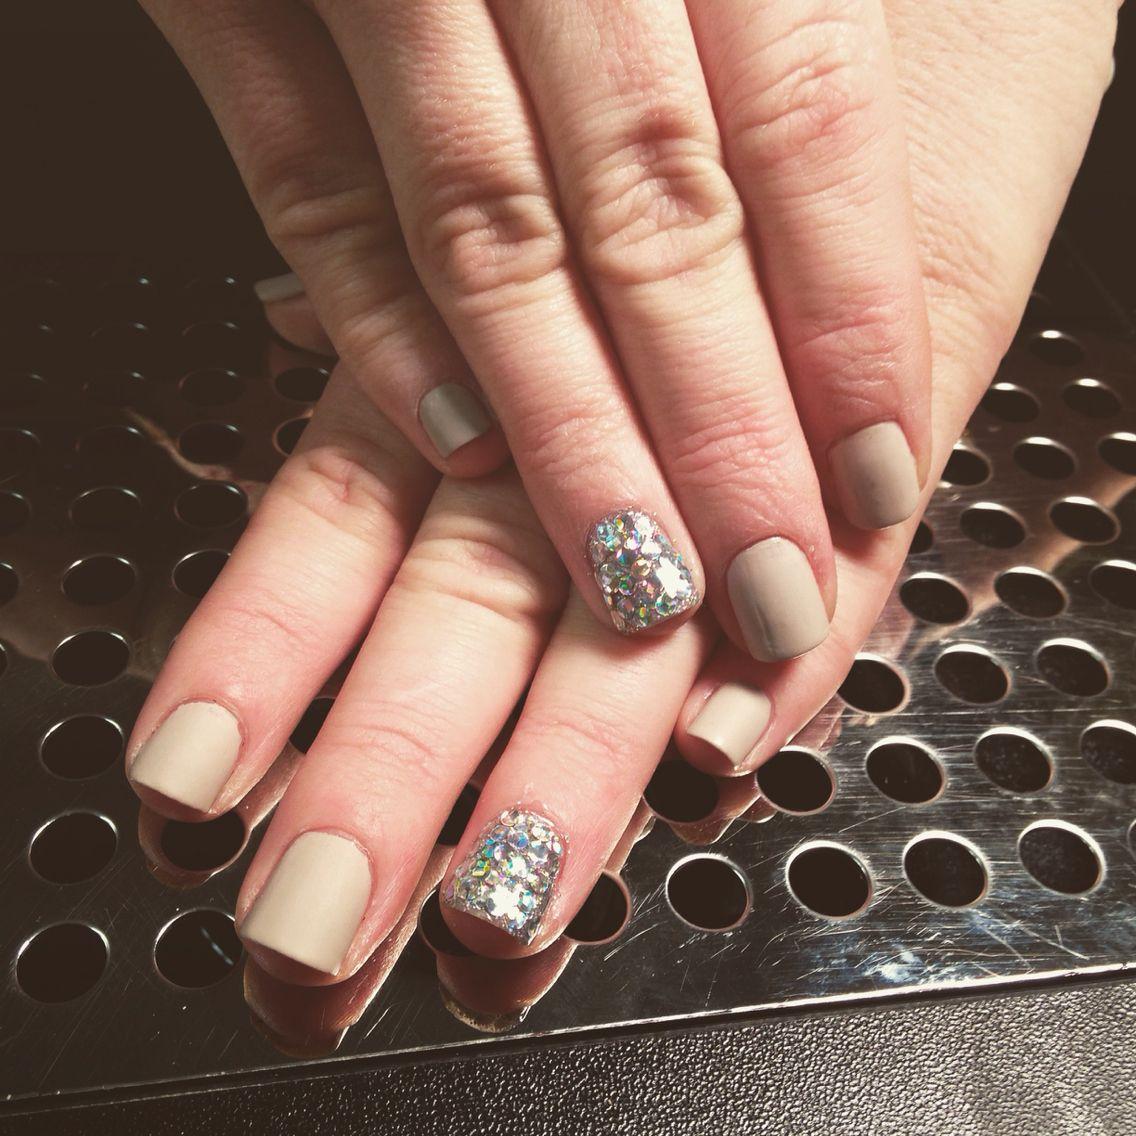 Morgan Taylor nail polish  with matte top coat,with glitter accent nail